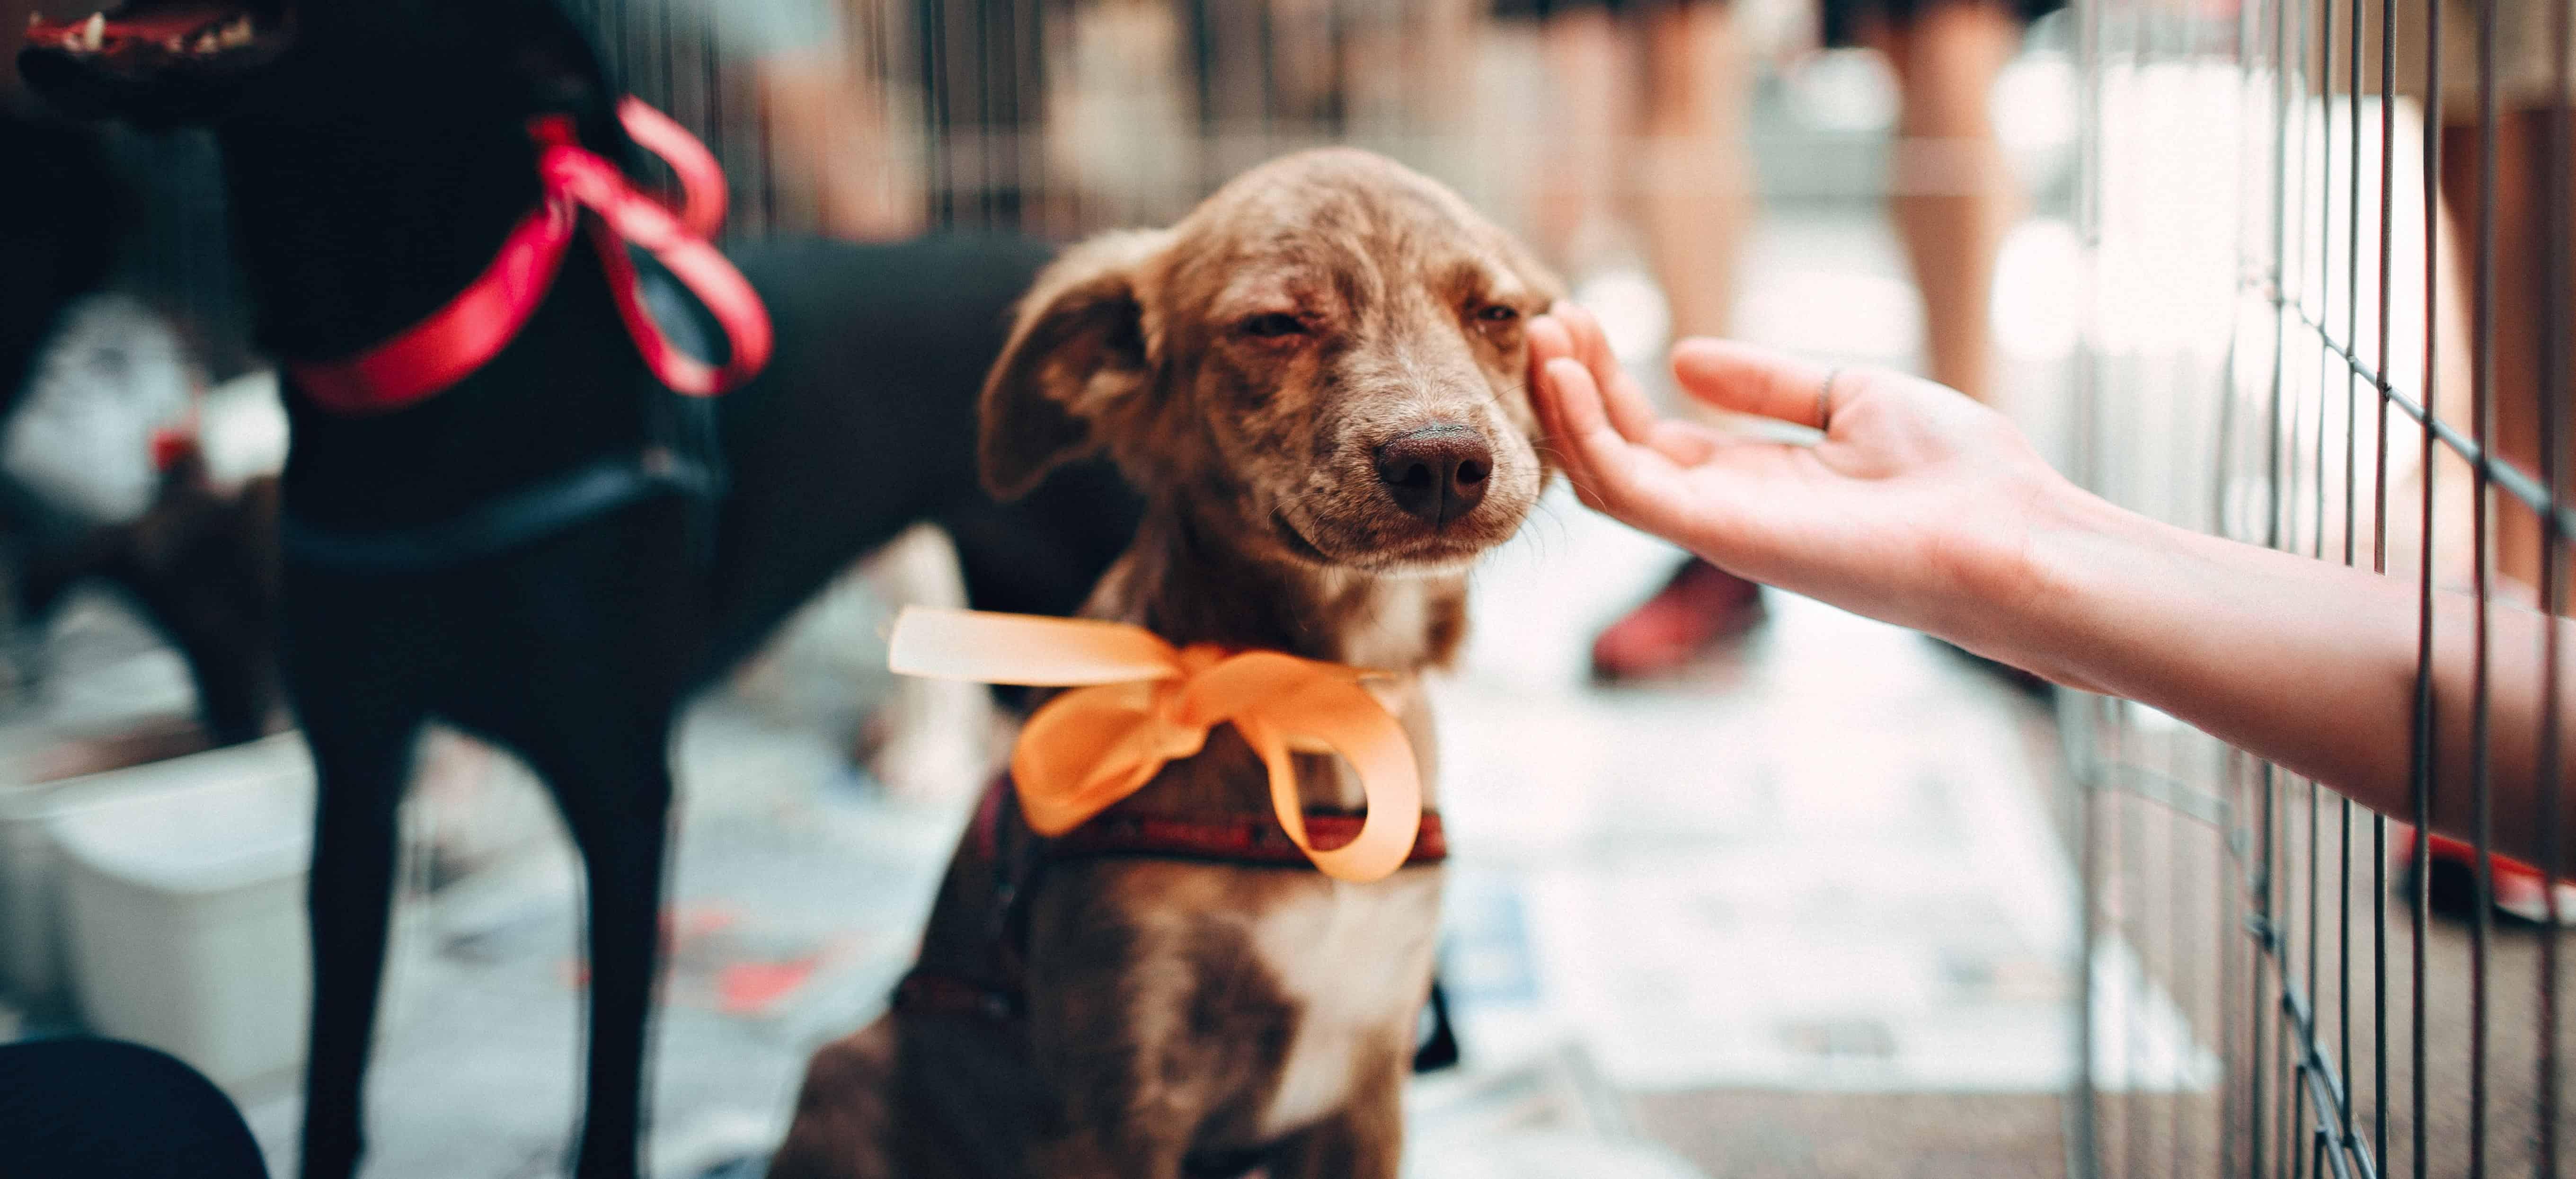 Average Cost of Adopting a Dog